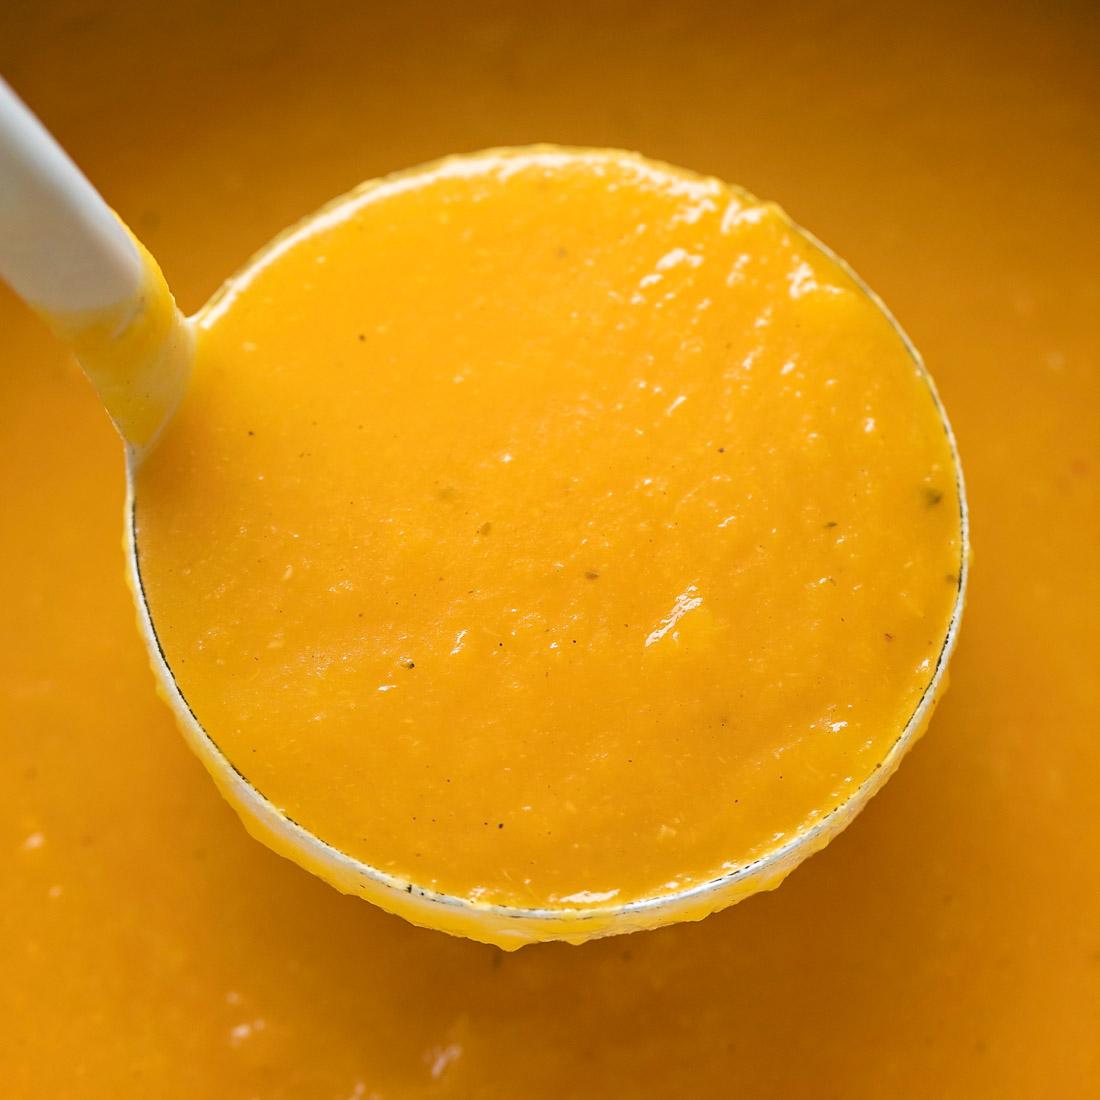 Ladle full of creamy pumpkin soup